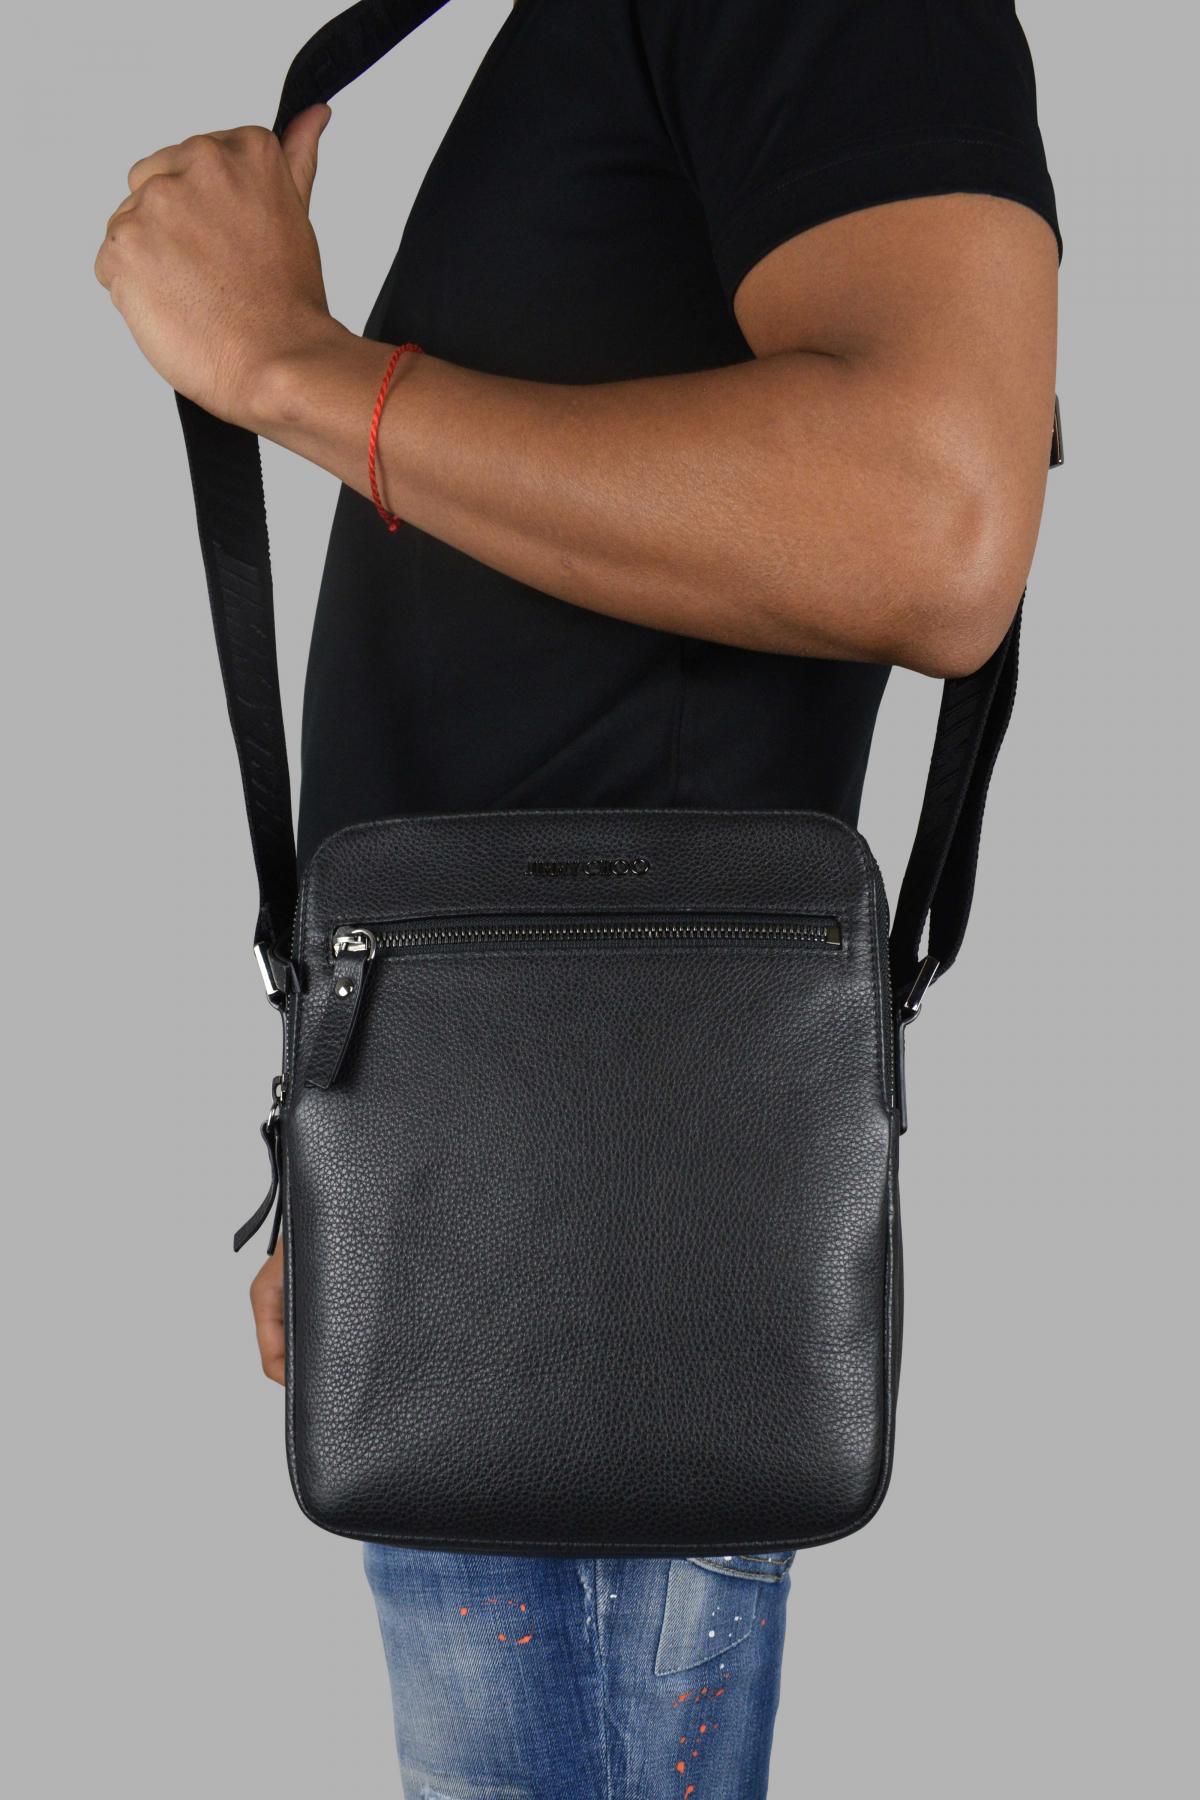 Jimmy Choo messenger bag in black leather.